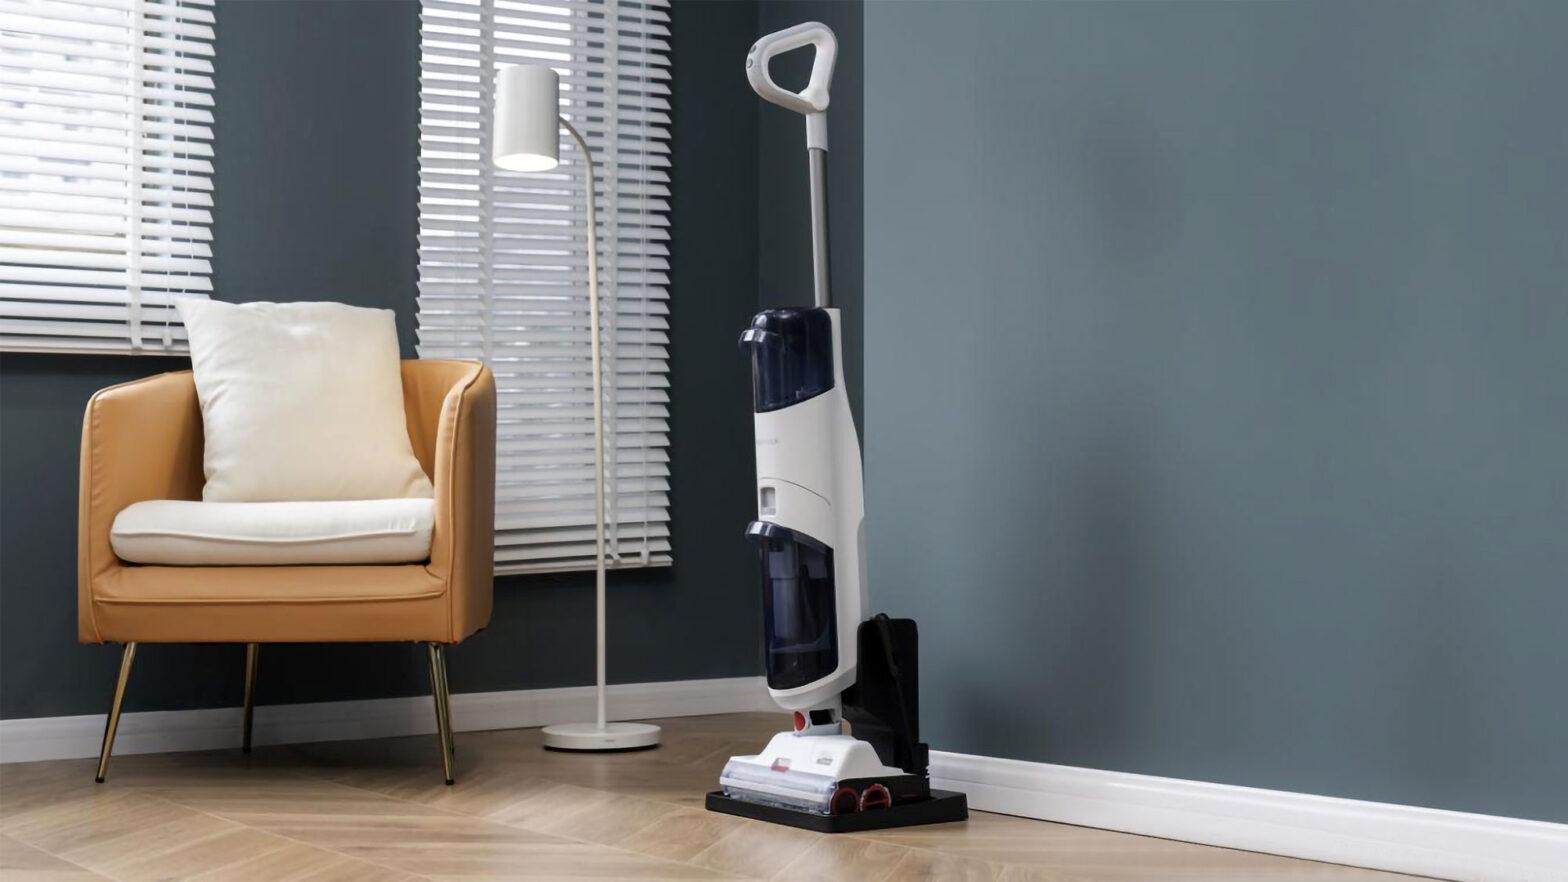 Roborock U10 Smart Stick Vacuum and Mop